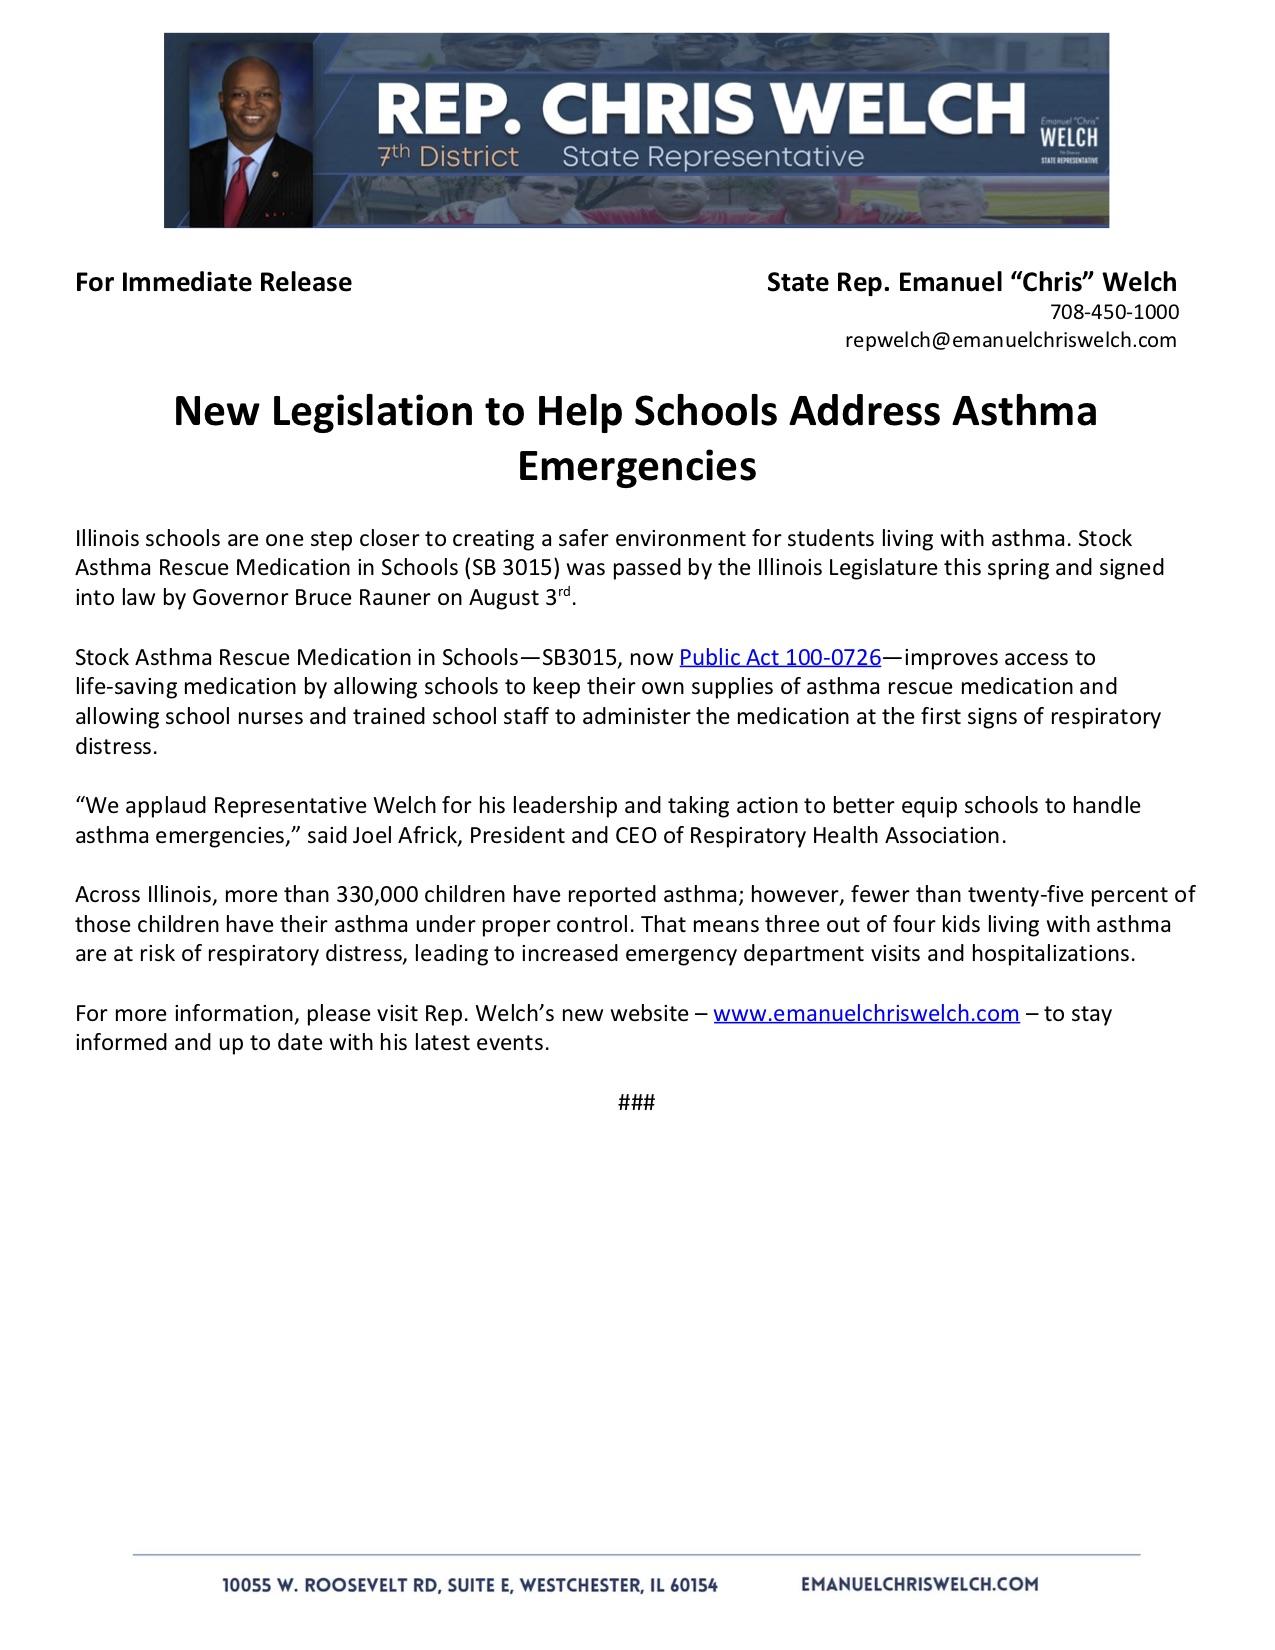 New Legislation to Help Schools Address Asthma Emergencies  (August 15, 2018)